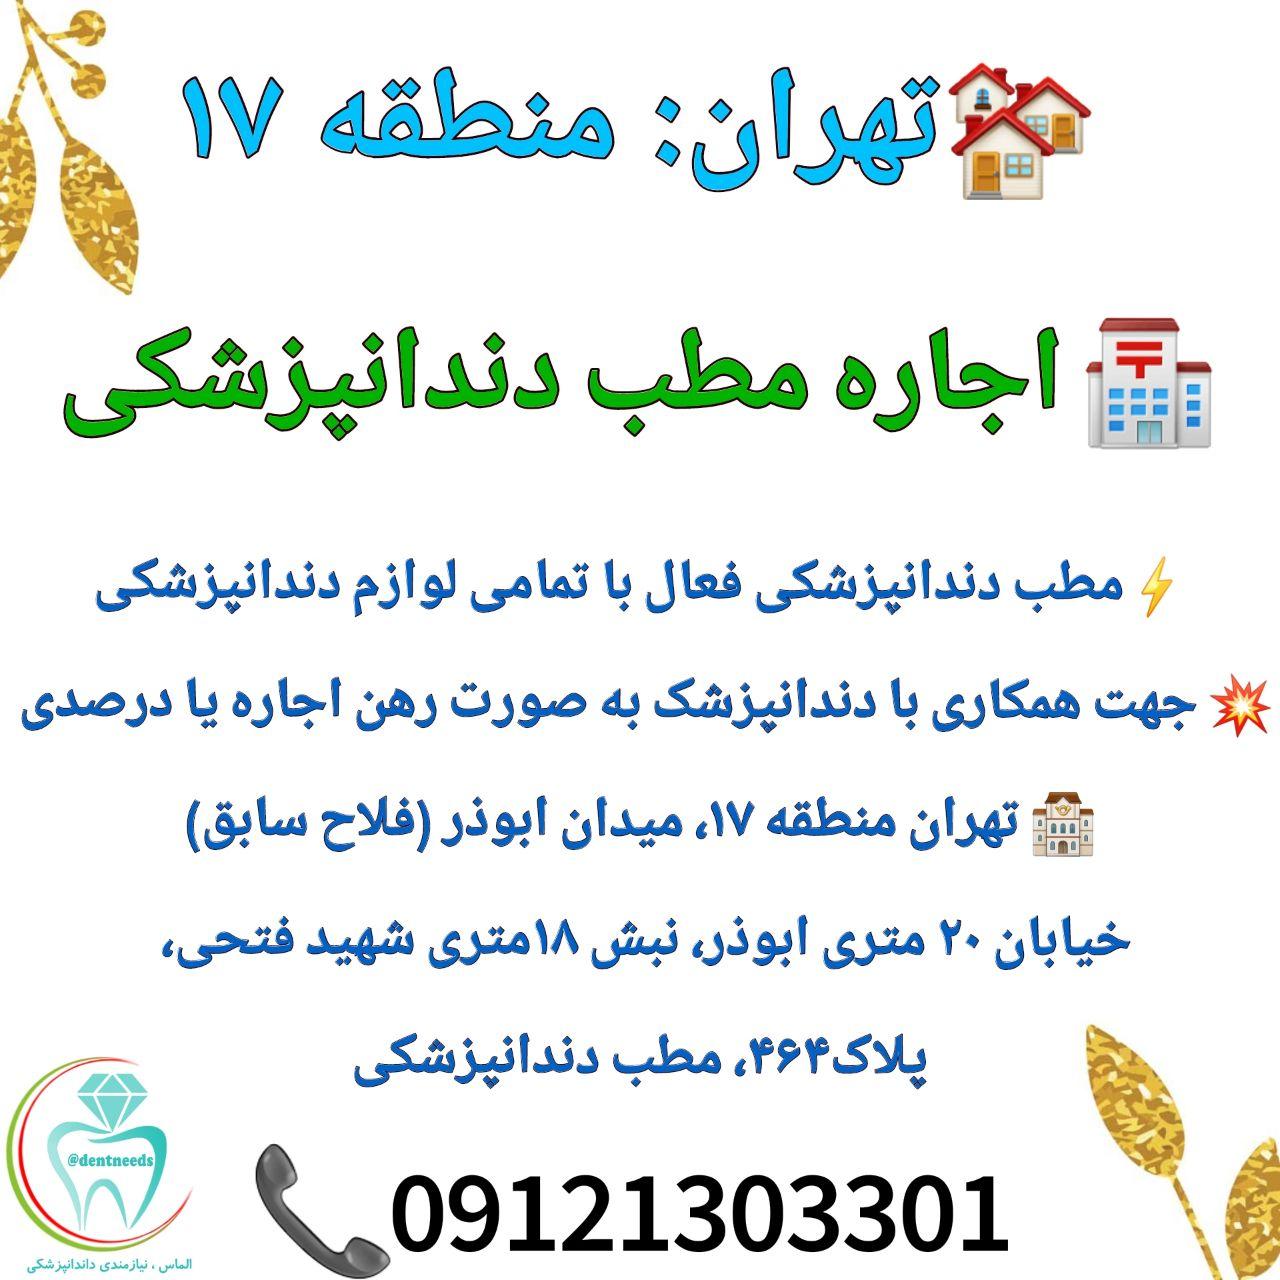 تهران: منطقه ۱۷، اجاره مطب دندانپزشکی